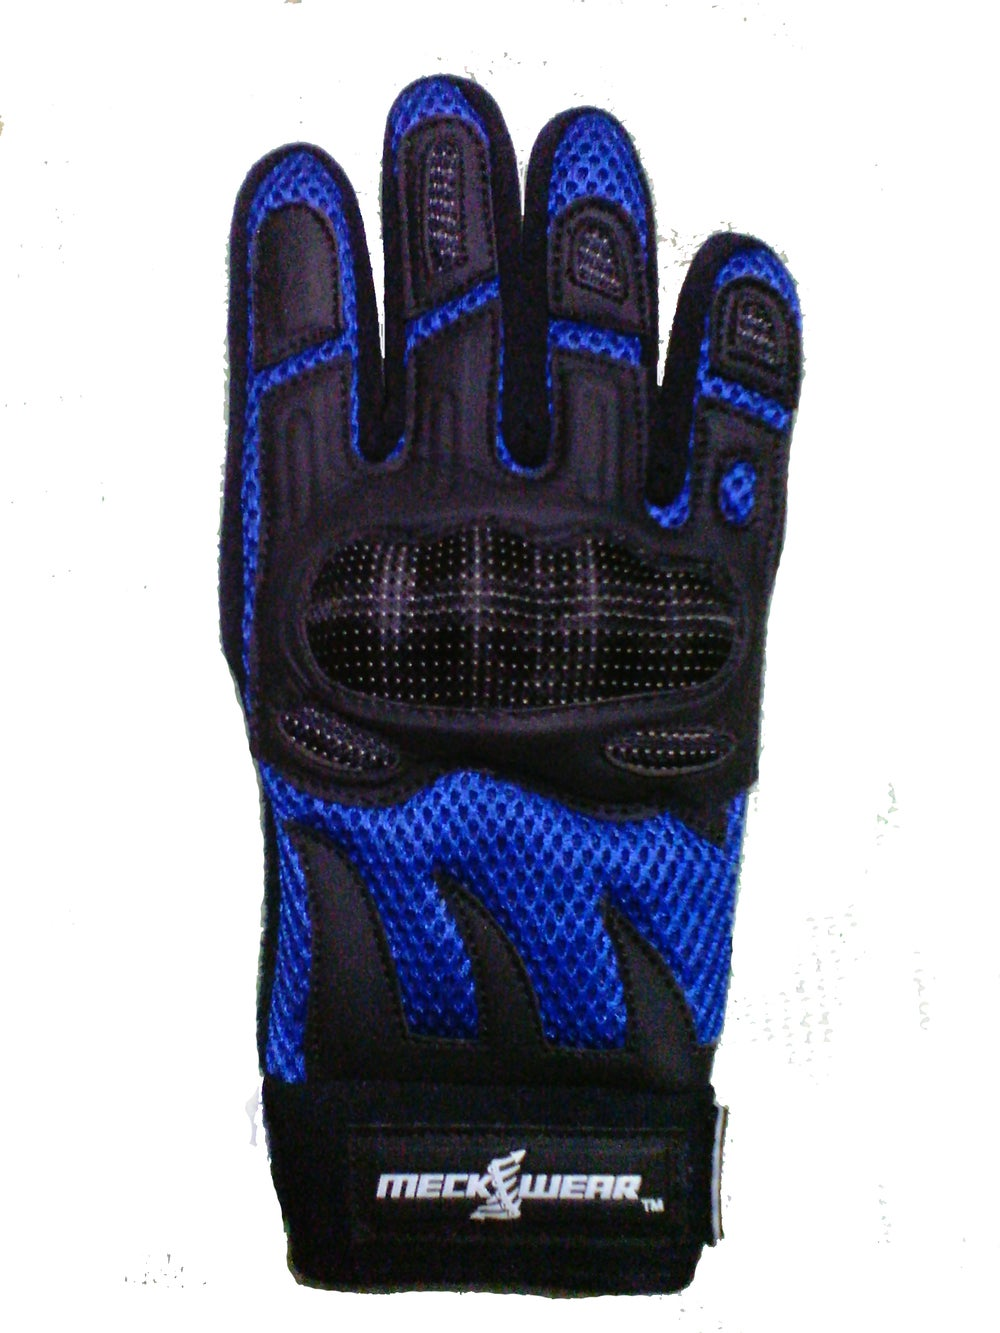 Image of Dark Blue Enduro Crossover Gloves